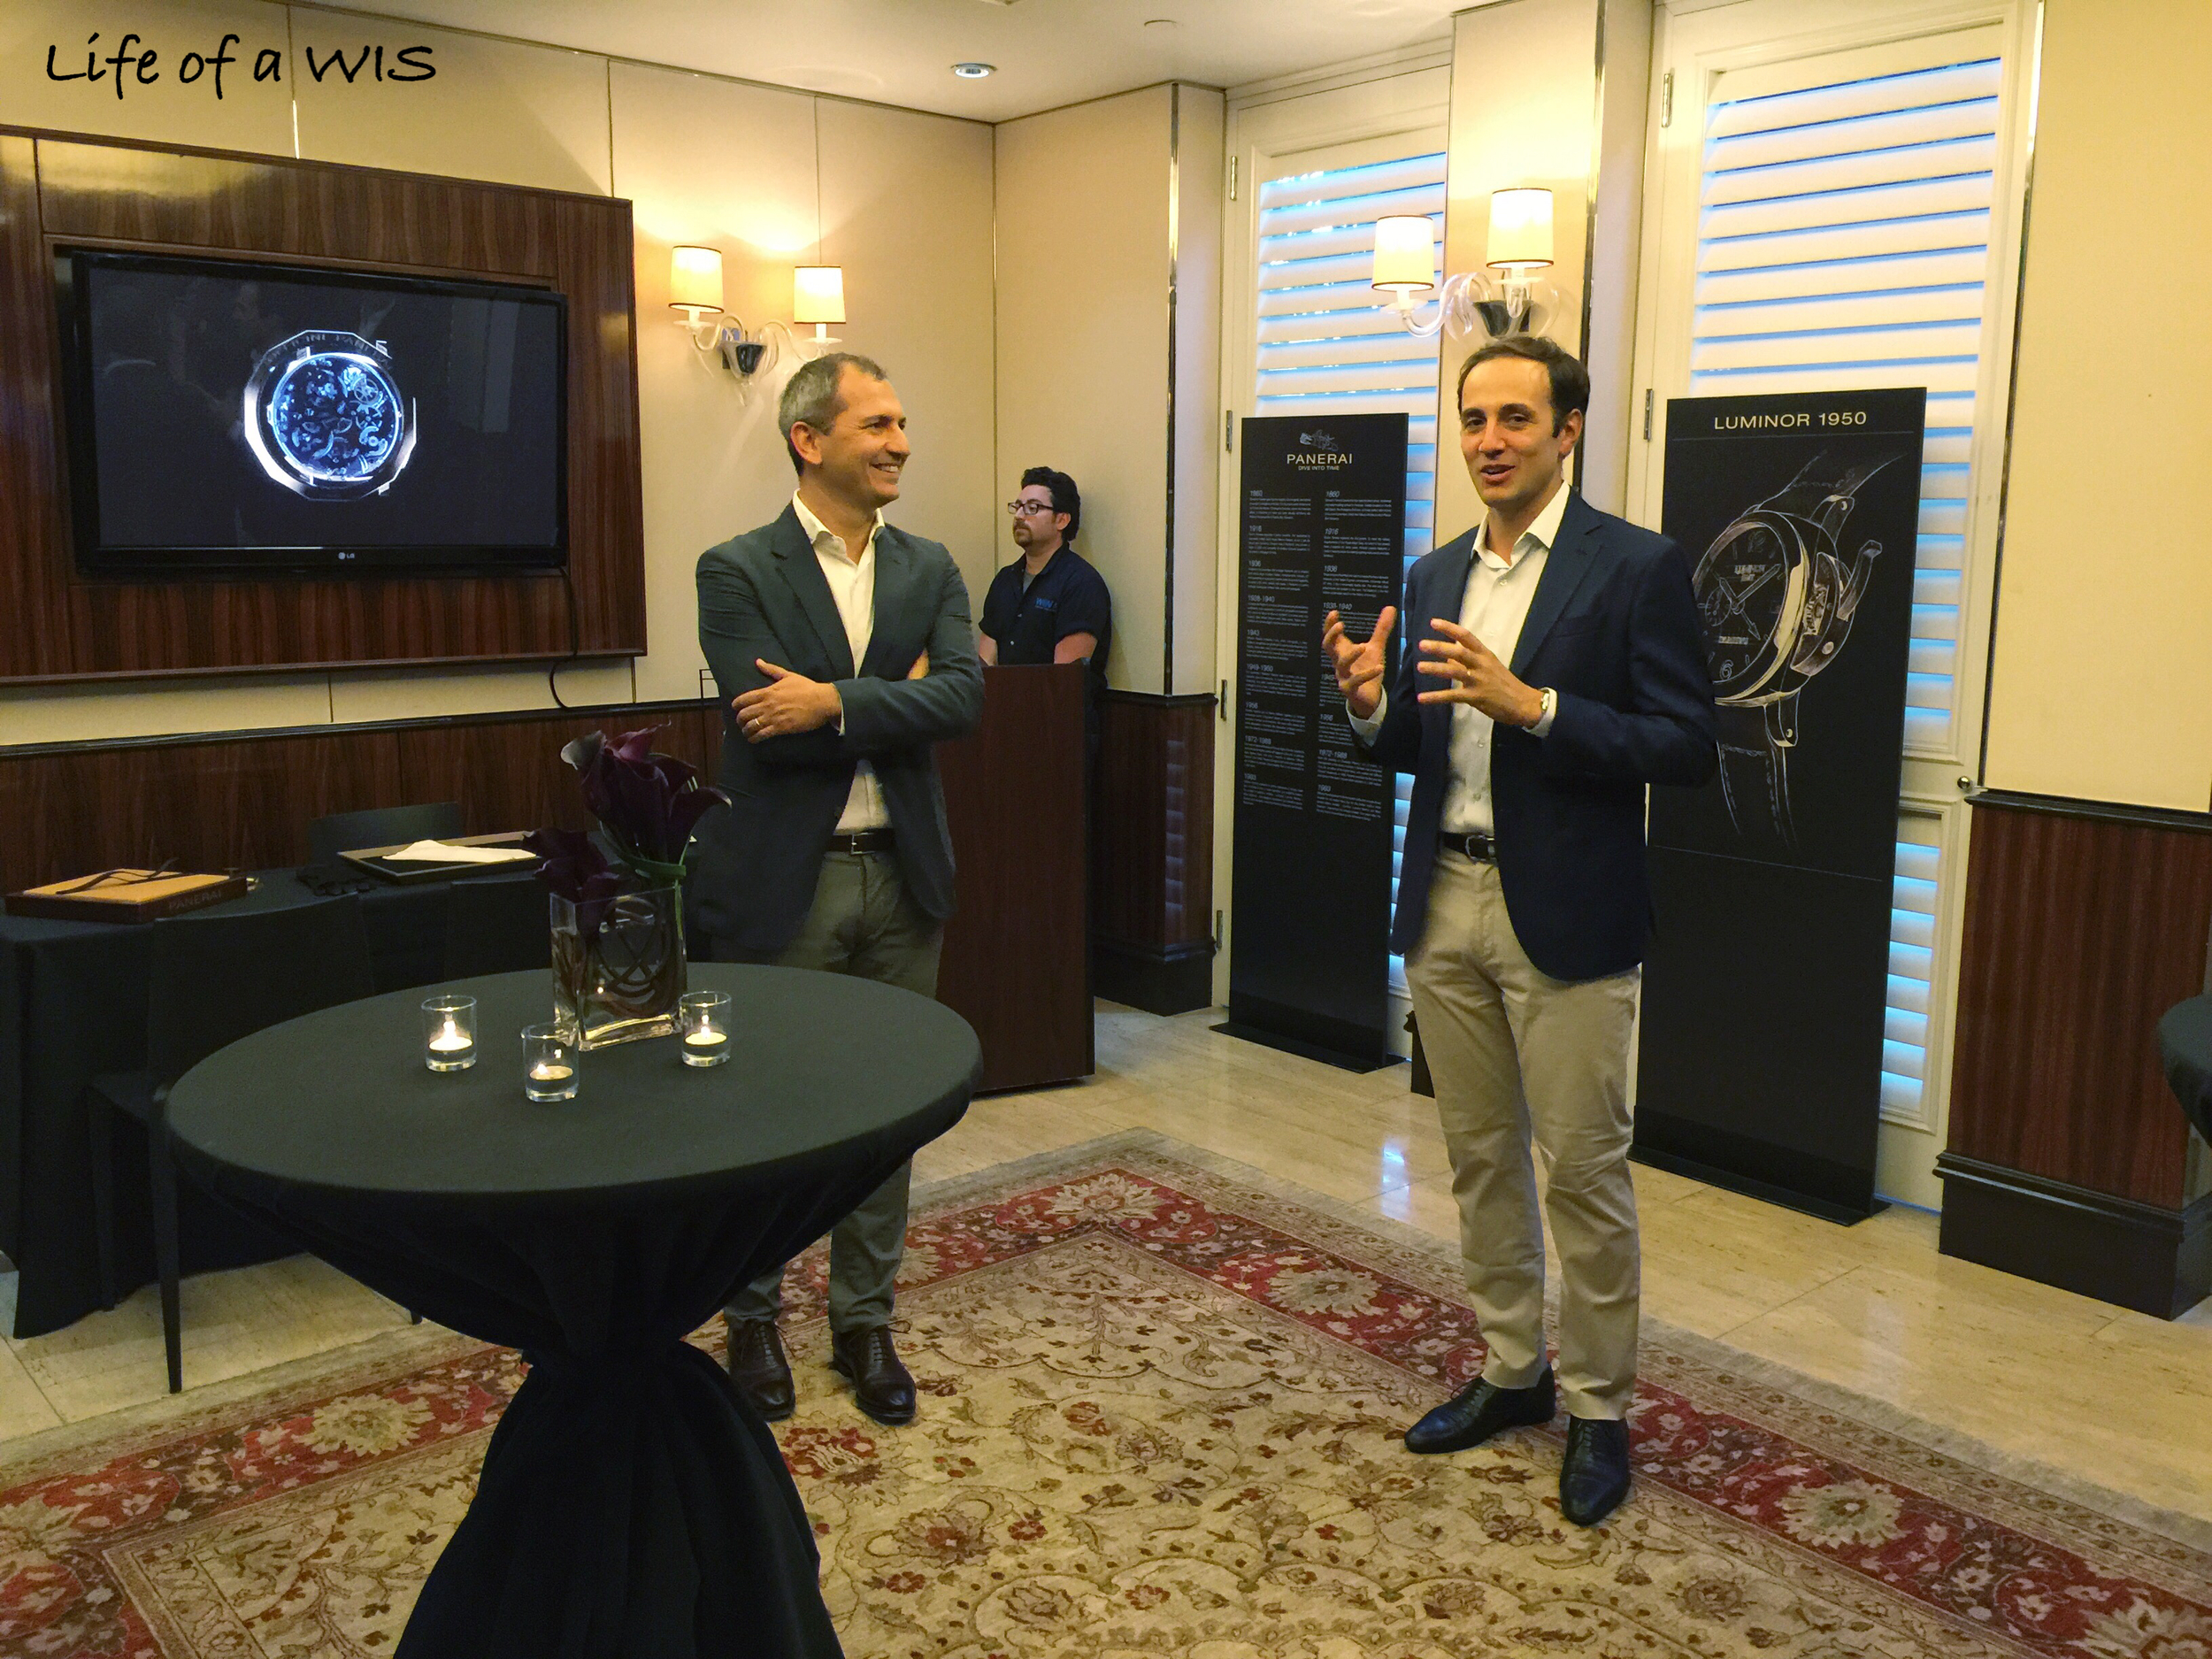 Giovanni Carestia (President of Panerai North America) on the right, Alessandro Ficarelli (Product Development Director) on the left.